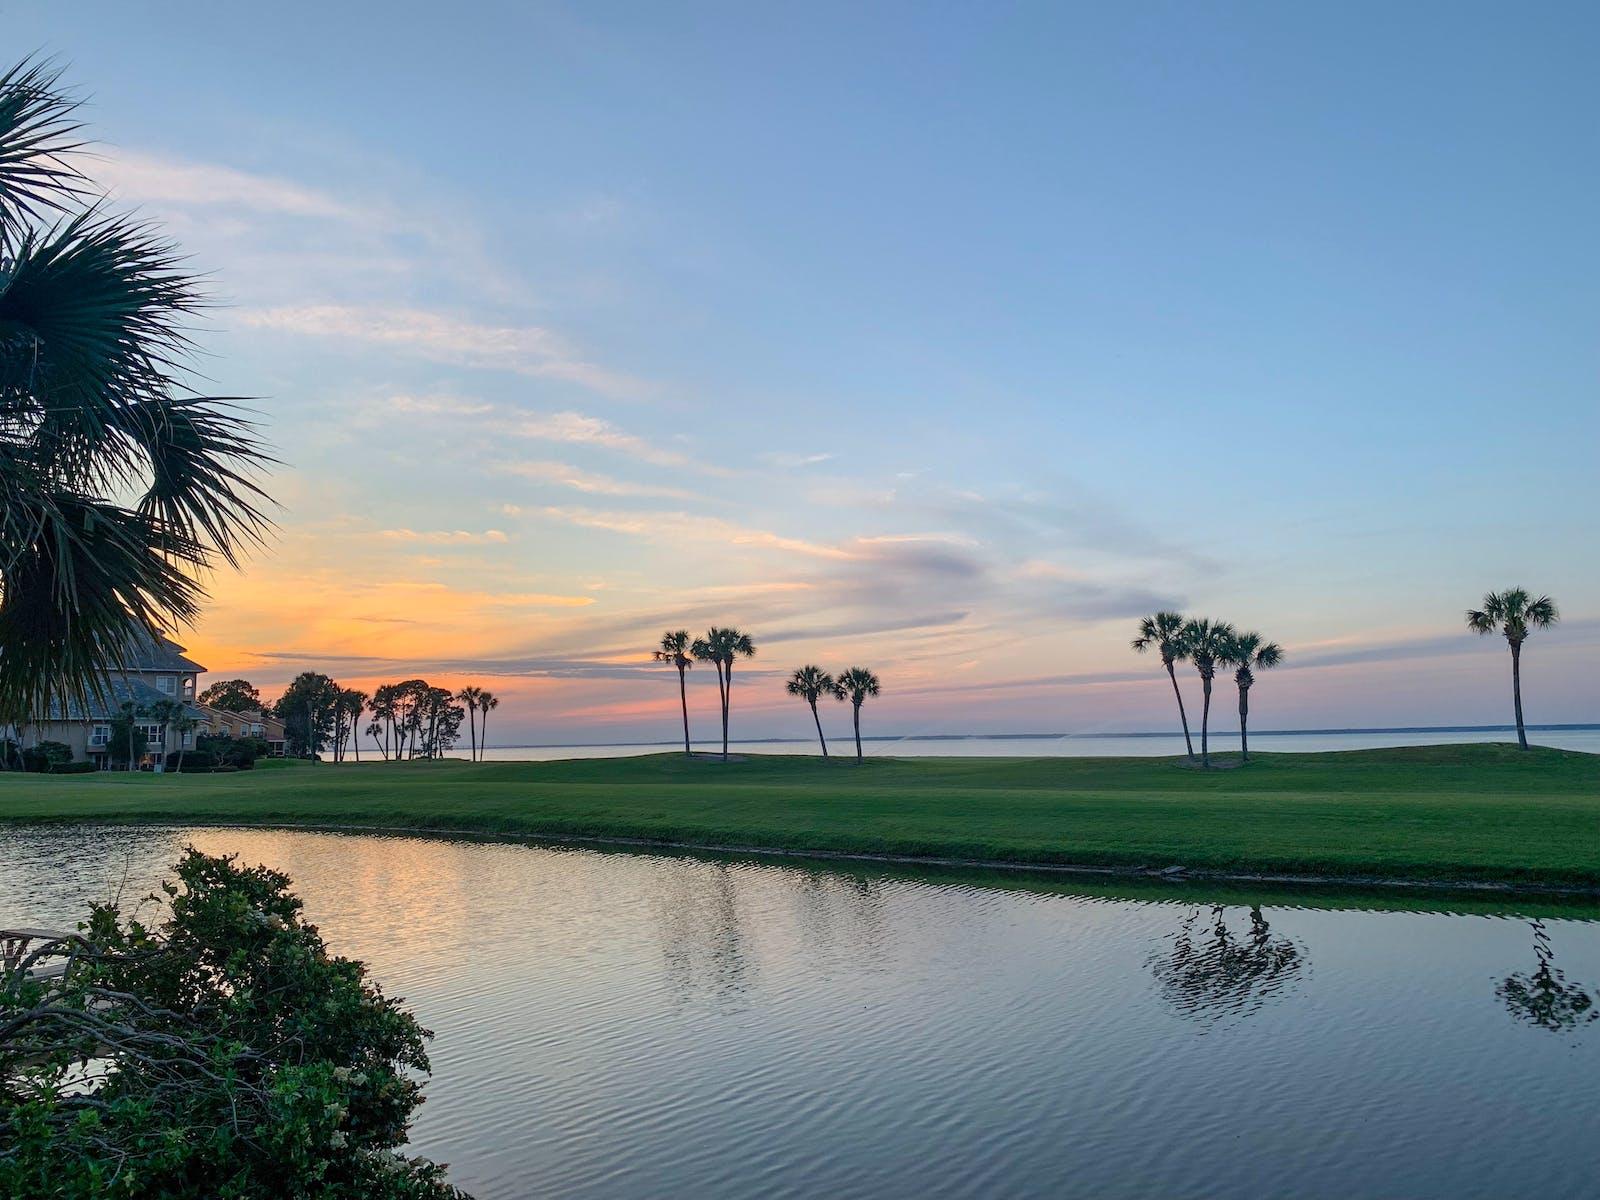 Golf course in Central America